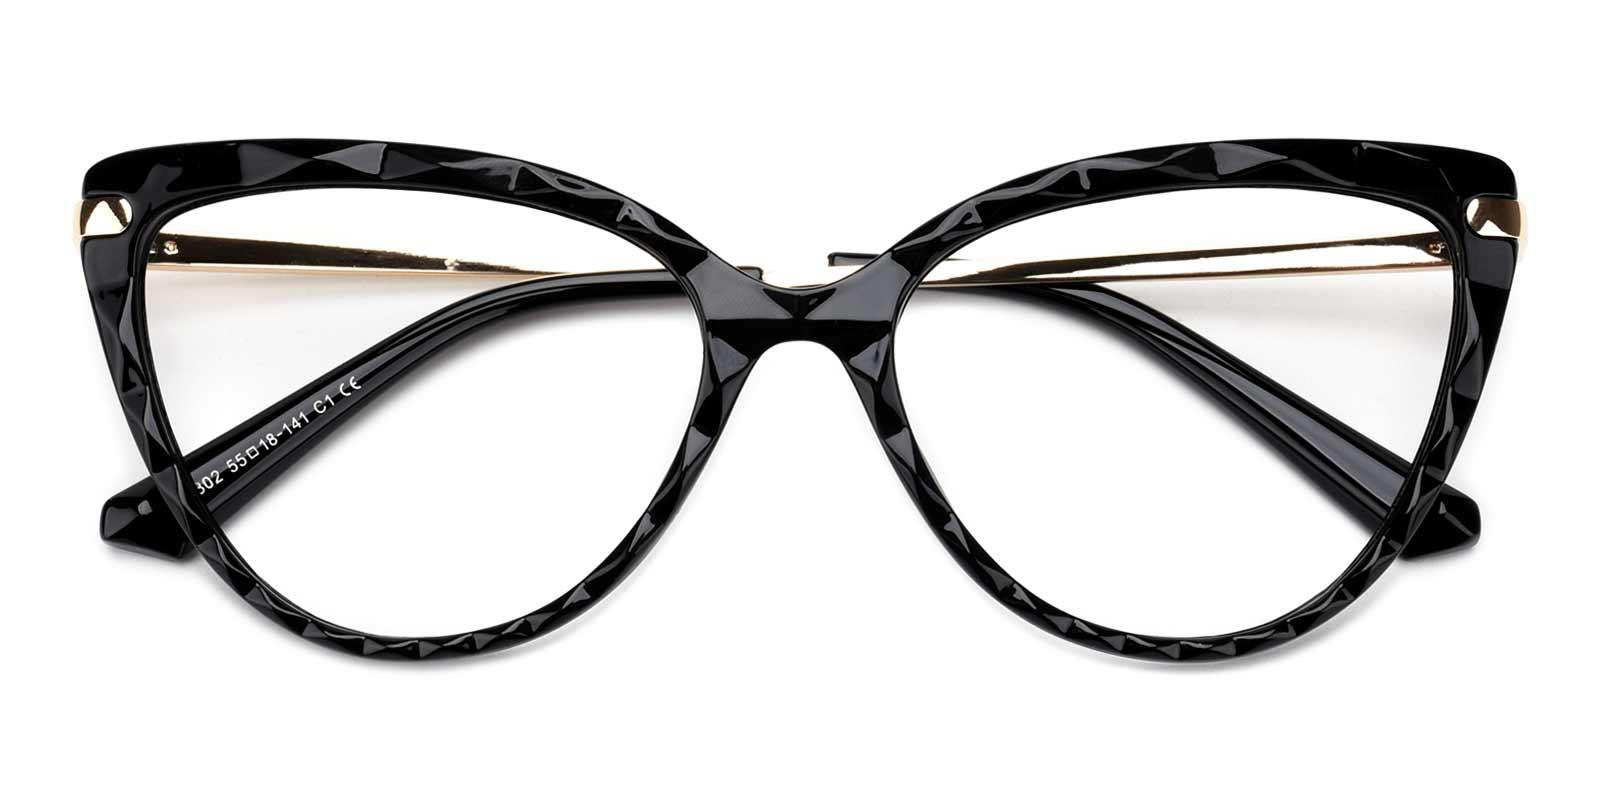 Truda-Black-Cat-Combination-Eyeglasses-detail